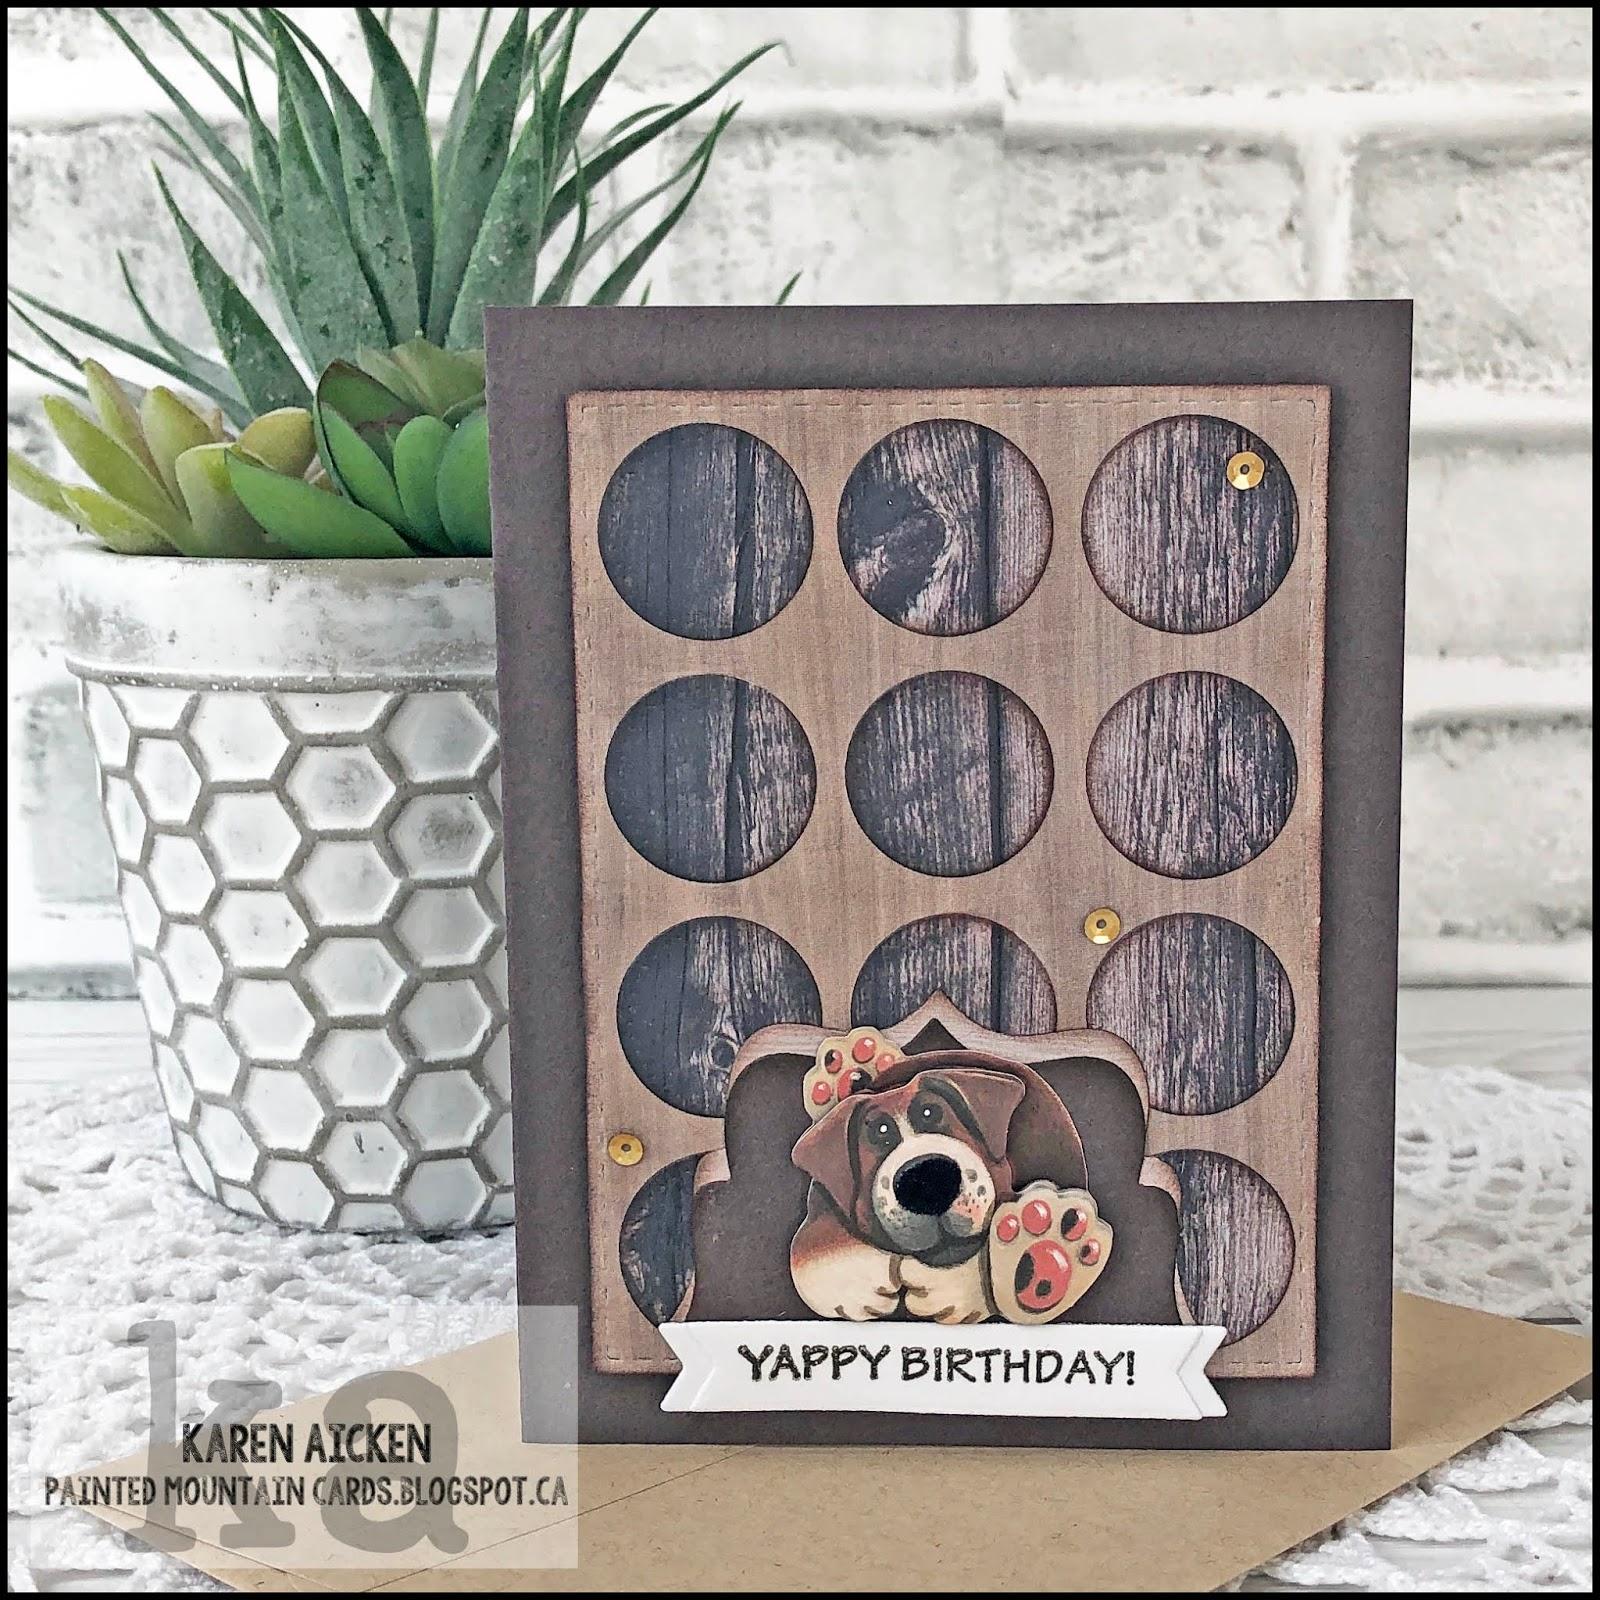 Duo2 Sergei Ekaterina Images: Painted Mountain Cards: Woodgrain & Dogs Birthday Card Duo